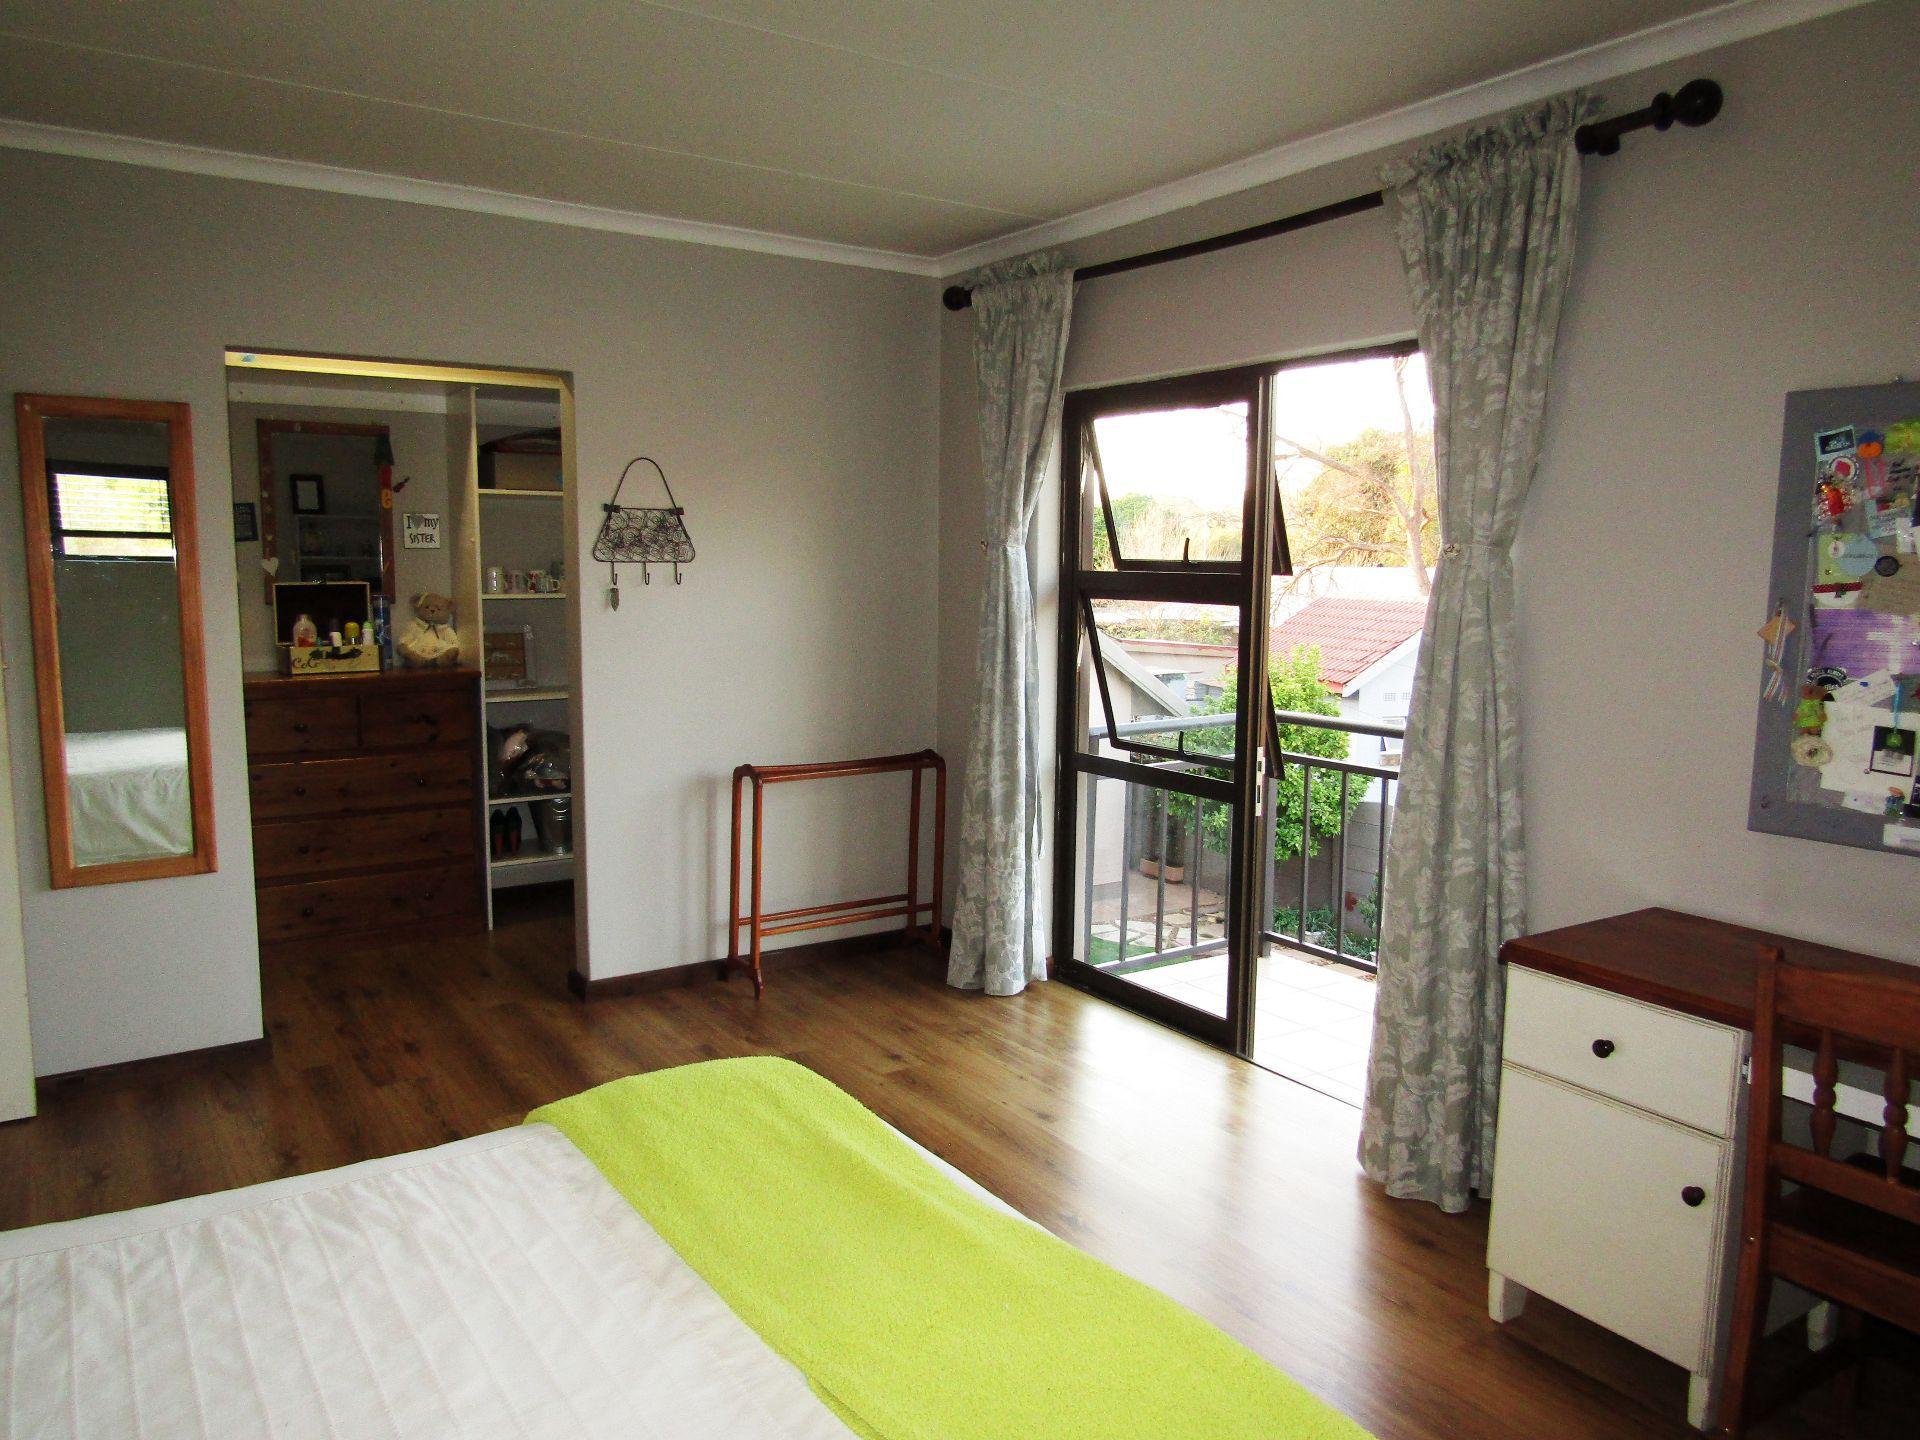 Heilige Akker property for sale. Ref No: 13531943. Picture no 20